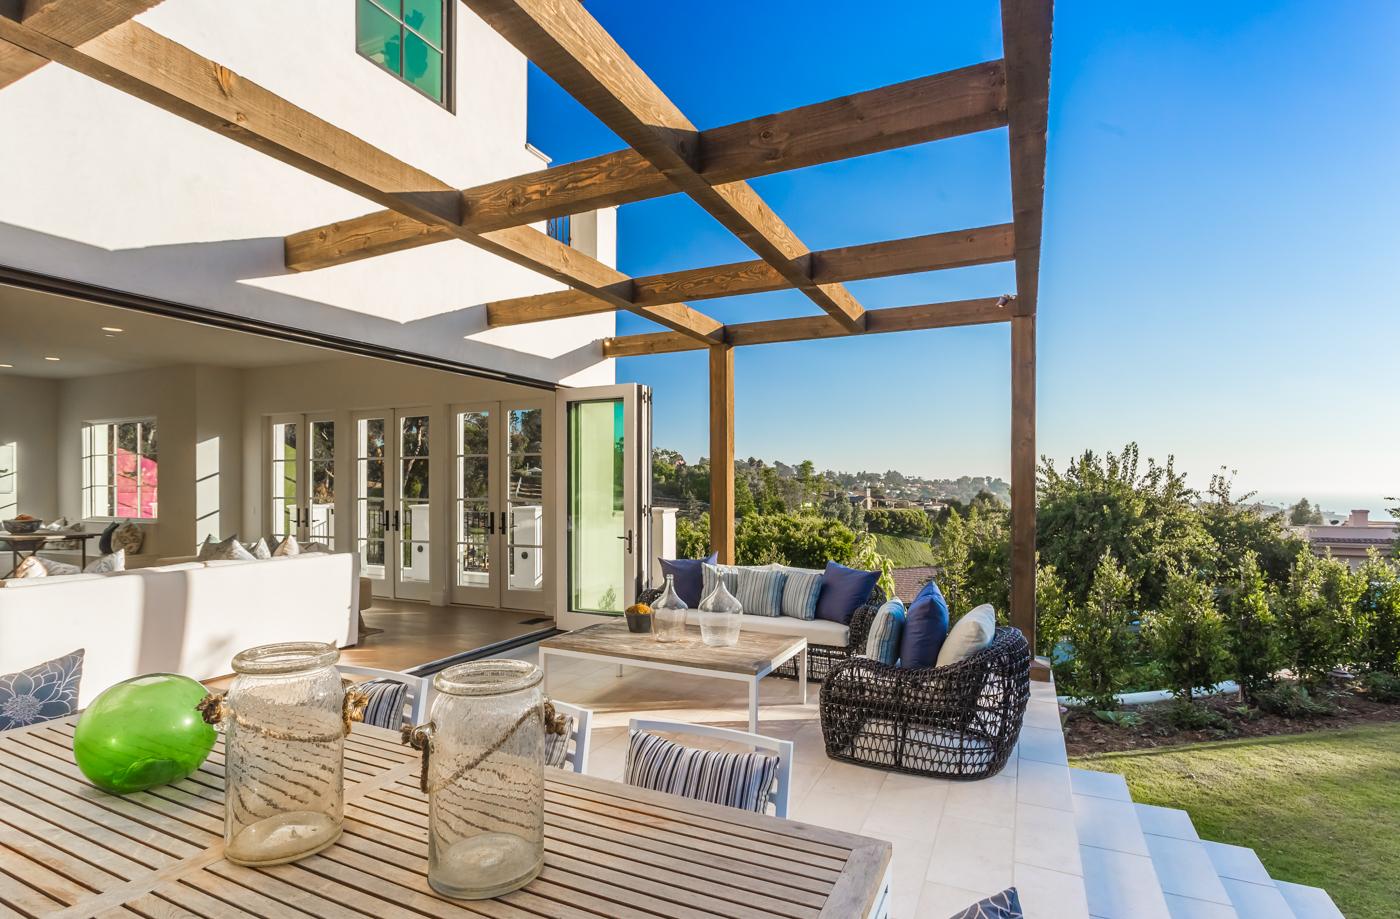 Sold 2017 Laura Represented Seller -  La Jolla, CA 92037